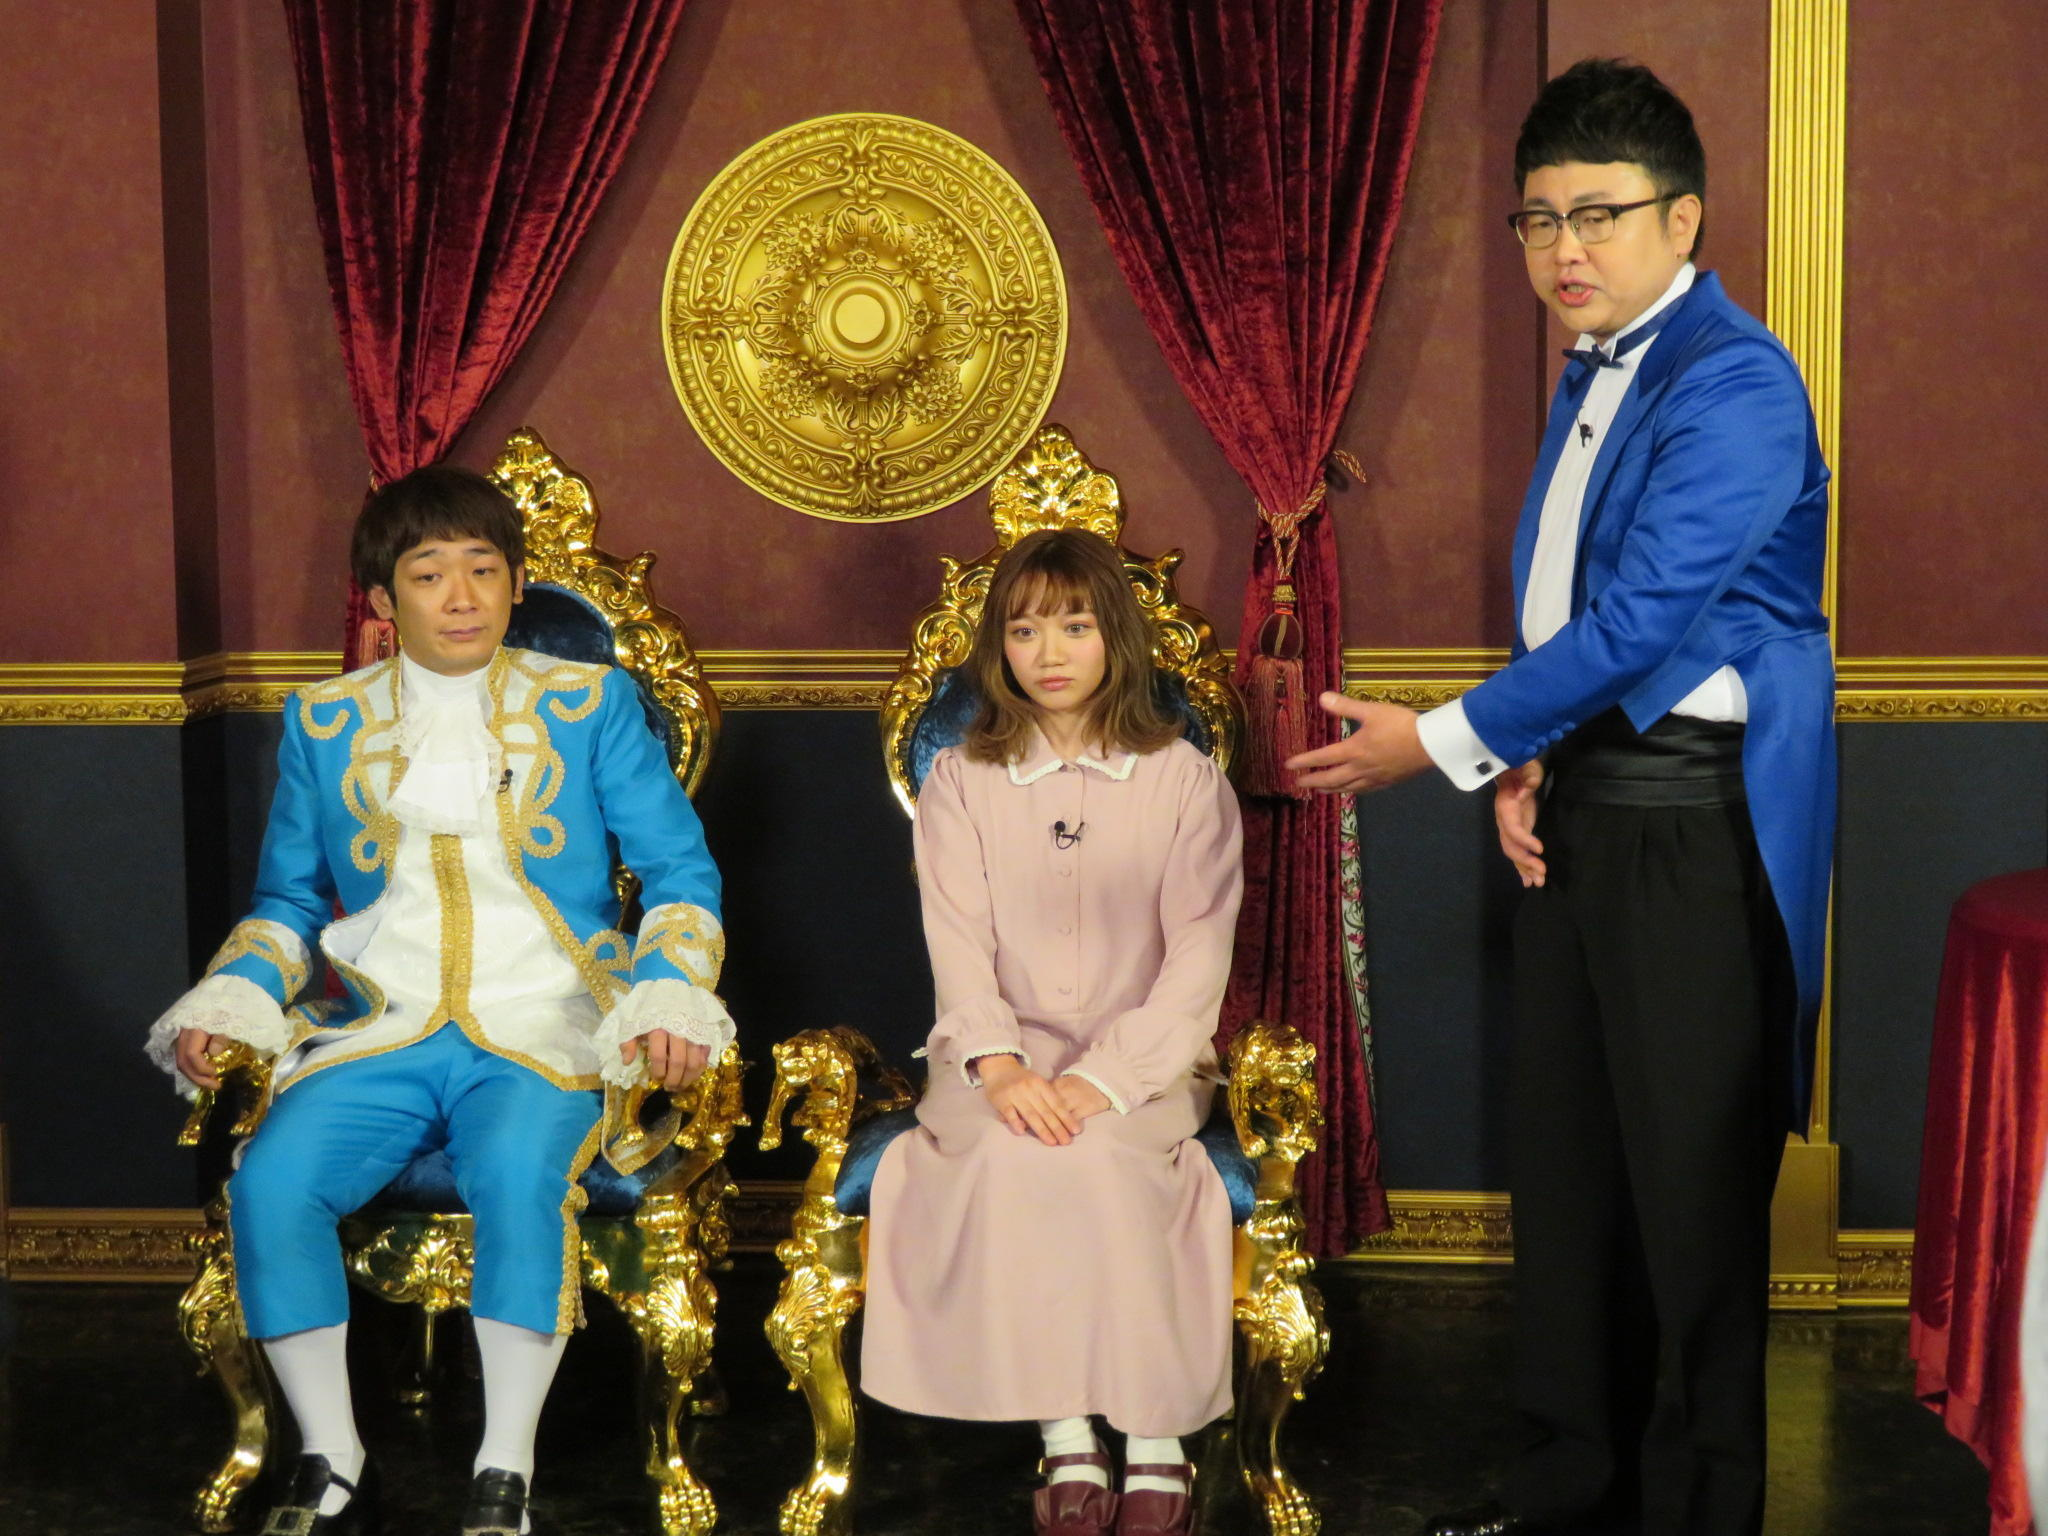 http://news.yoshimoto.co.jp/20180307201425-623aa241e4c74e4d0dd5153eccca700e36a77d80.jpg